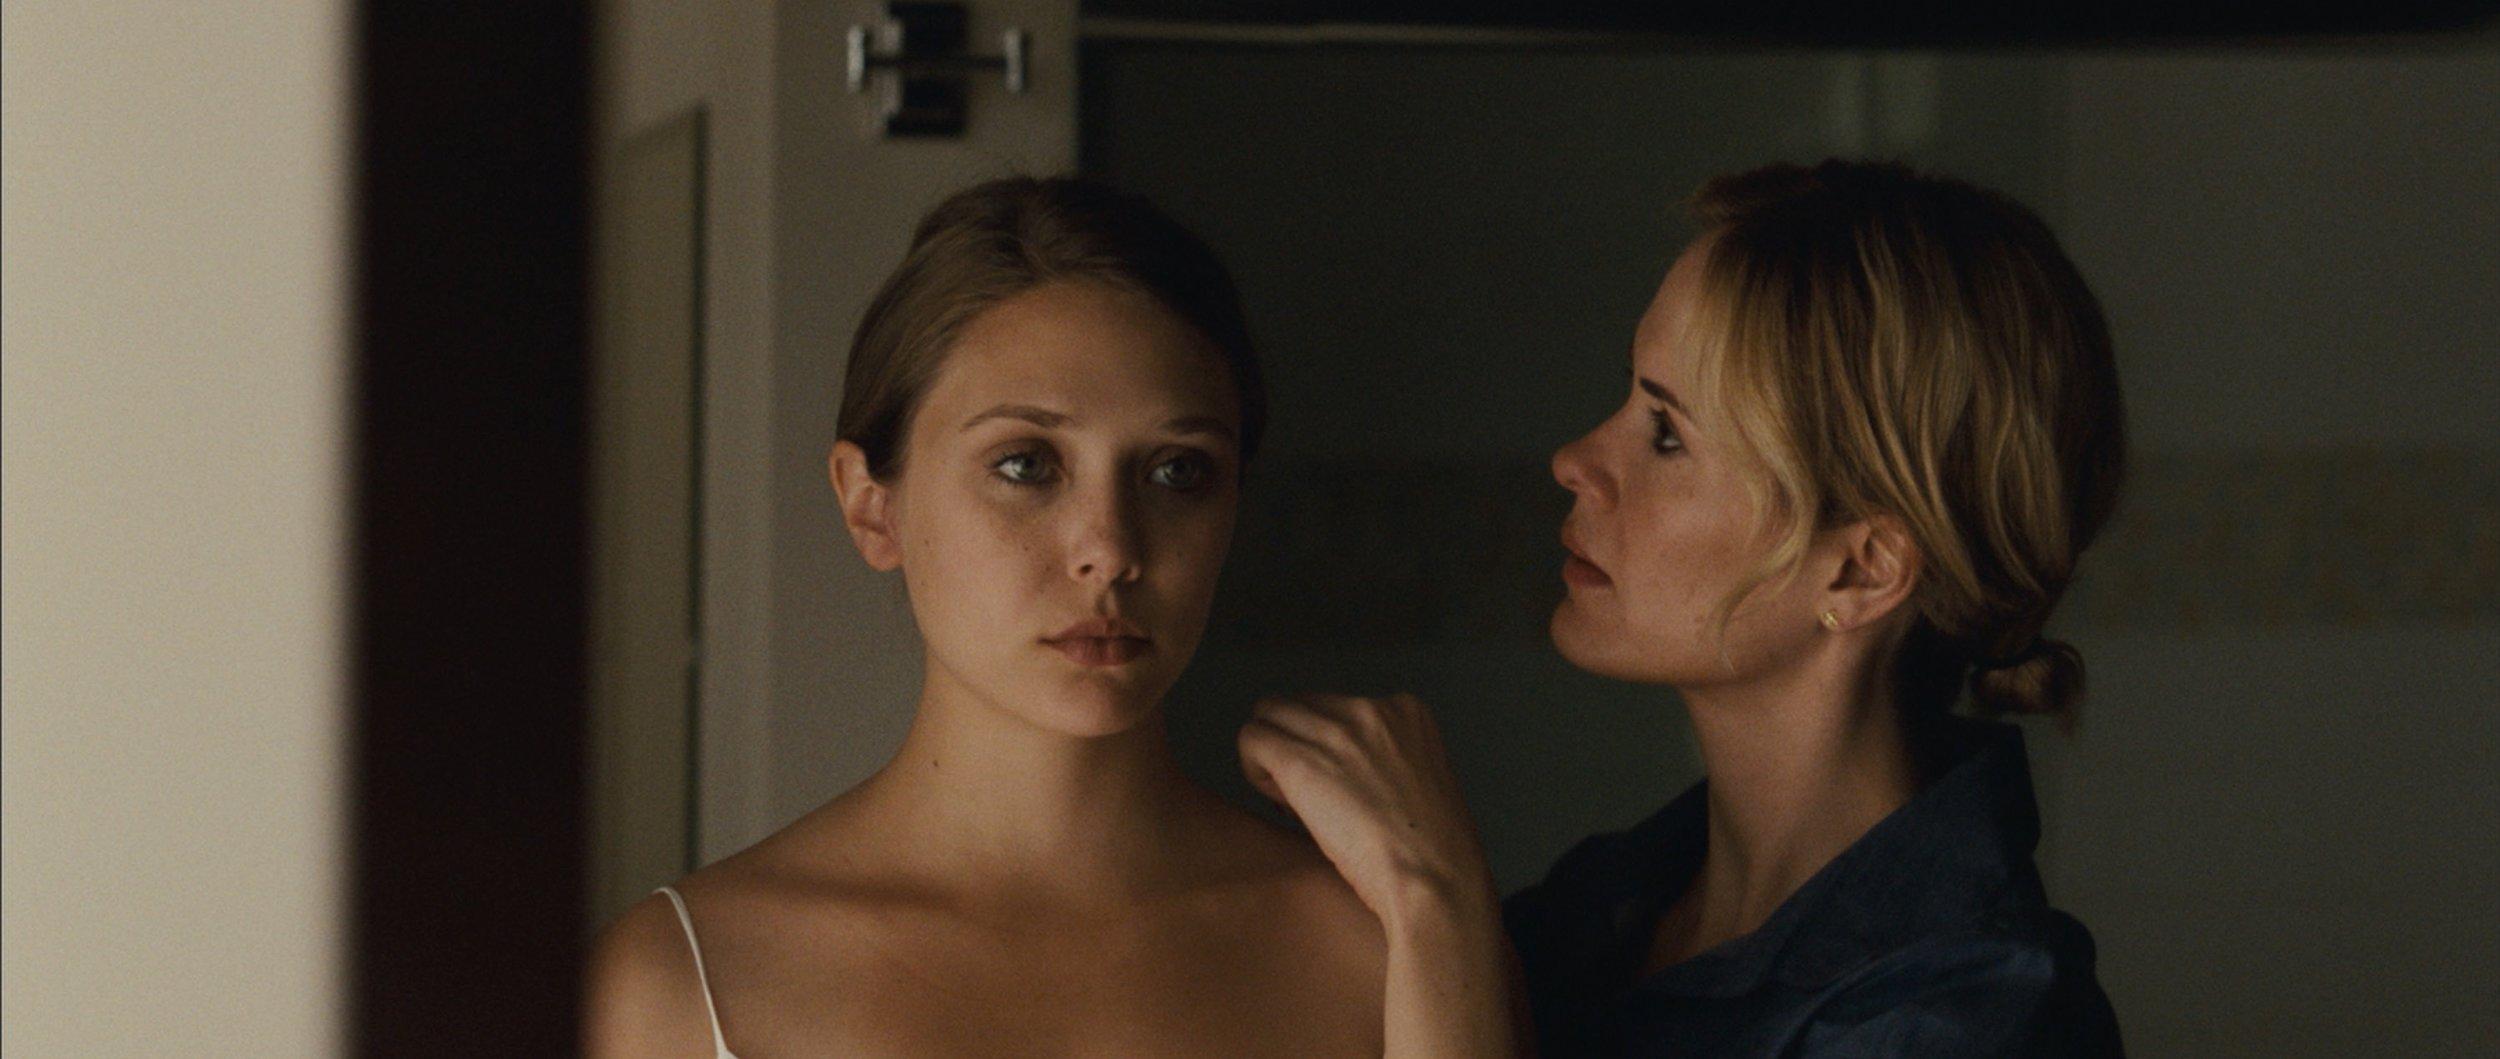 Martha_Marcy_May_Marlene_movie_image_elizabeth_olson_01.jpg